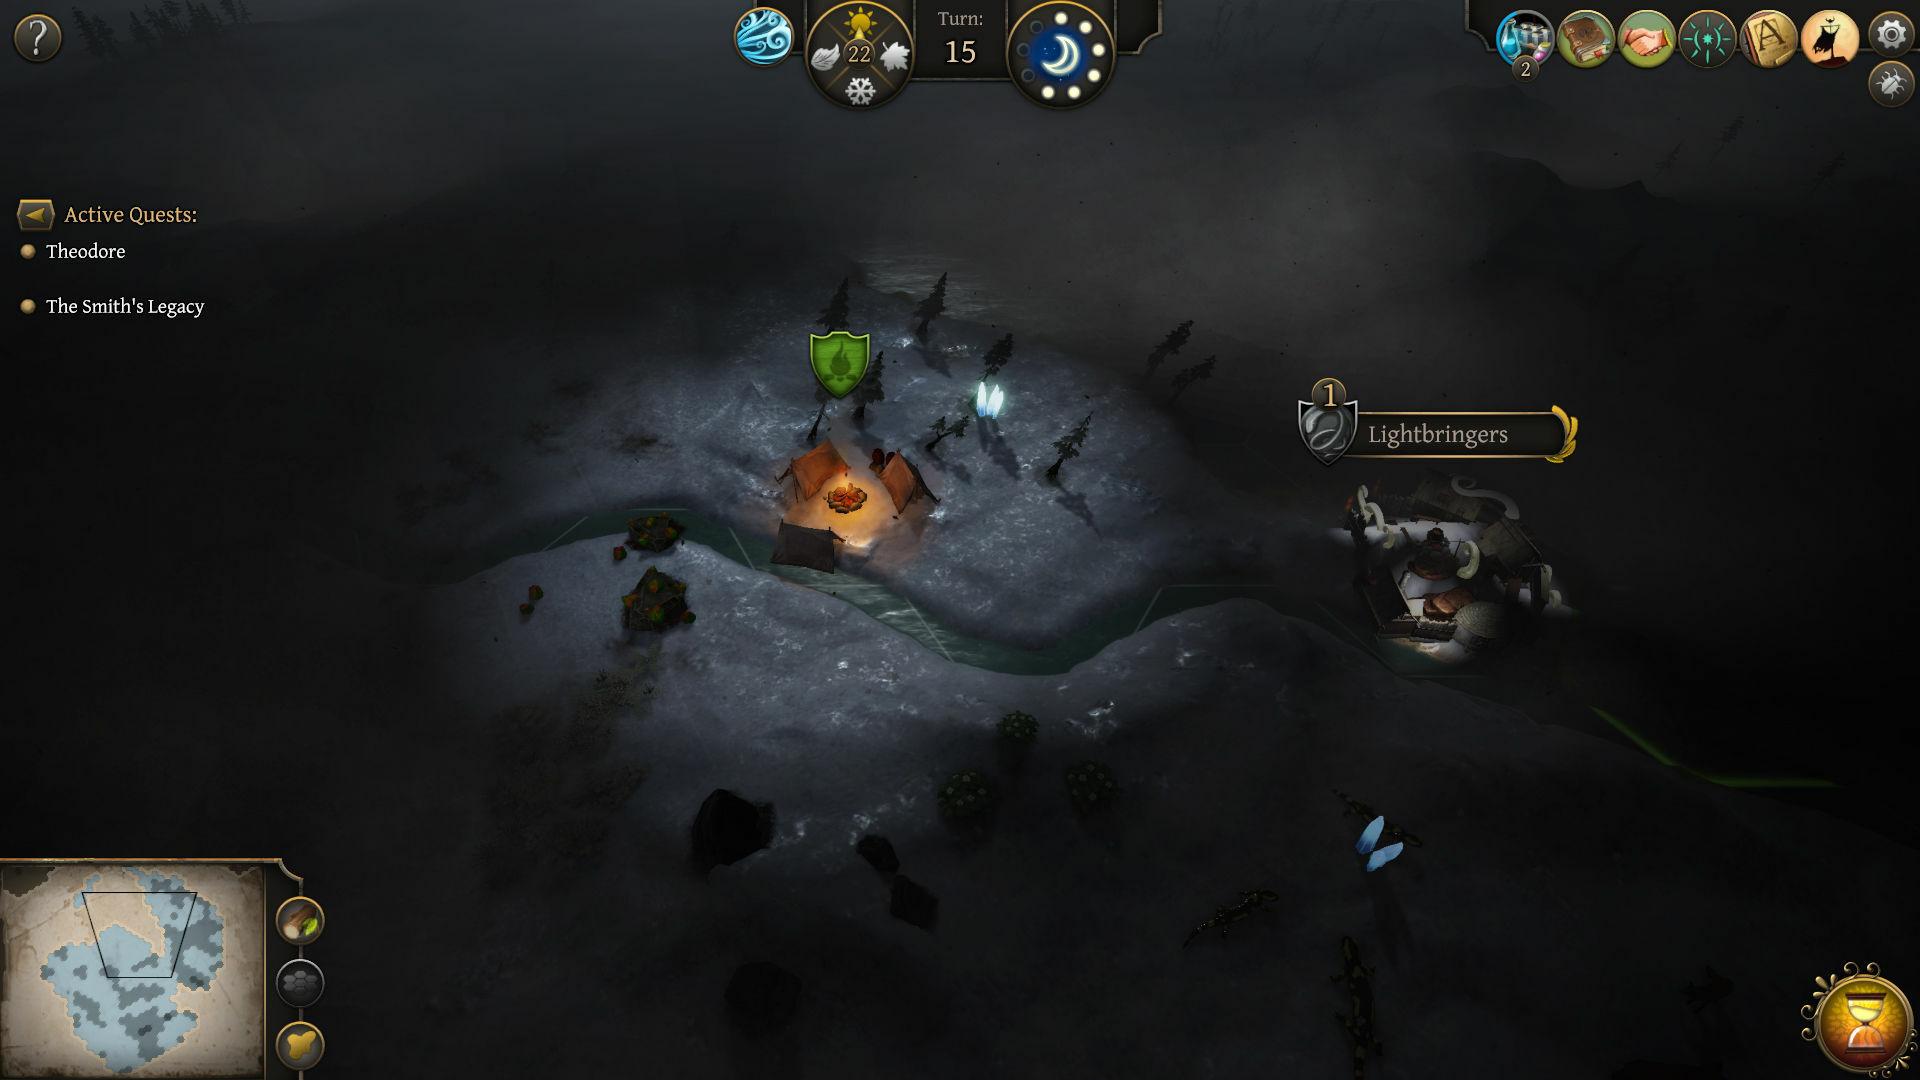 Thea 2: The Shattering screenshot 1